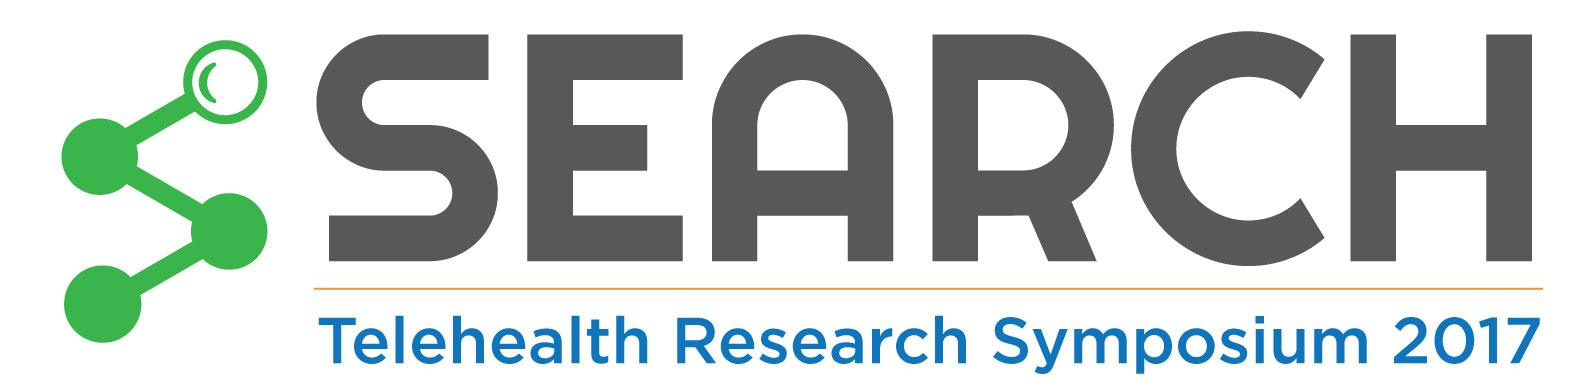 Telehealth Research Symposium